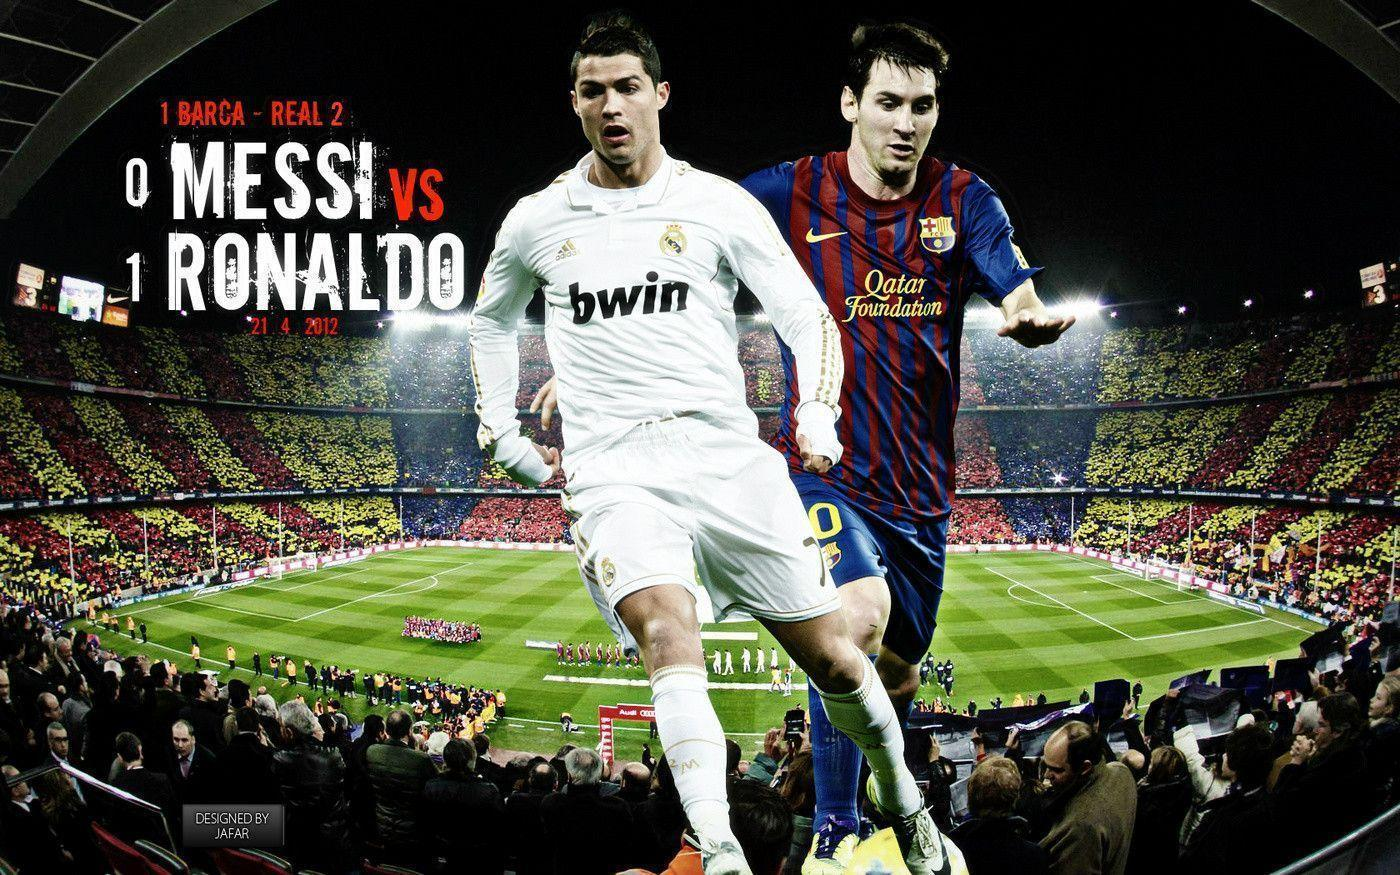 Ronaldo Vs Messi Wallpaper 2014 Ronaldo And Mes...